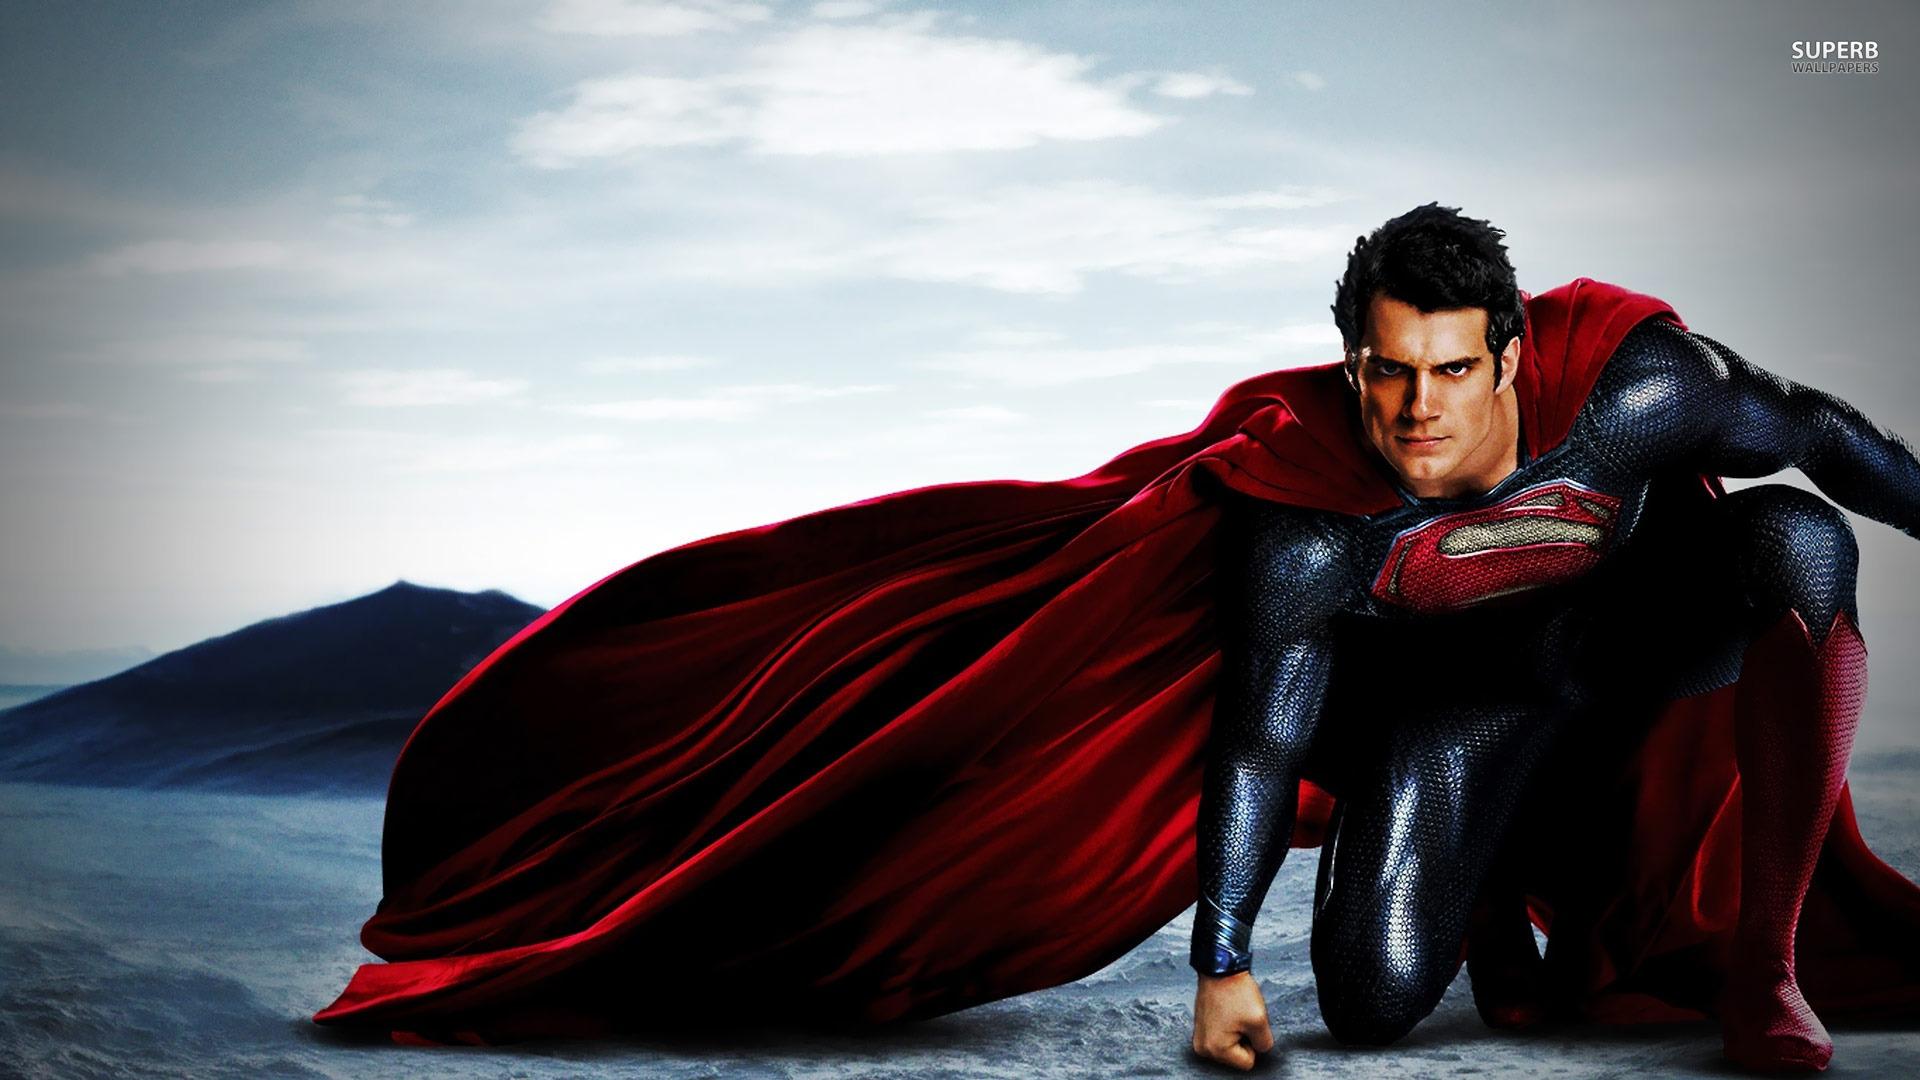 Superman HD Wallpaper for Desktop (7)